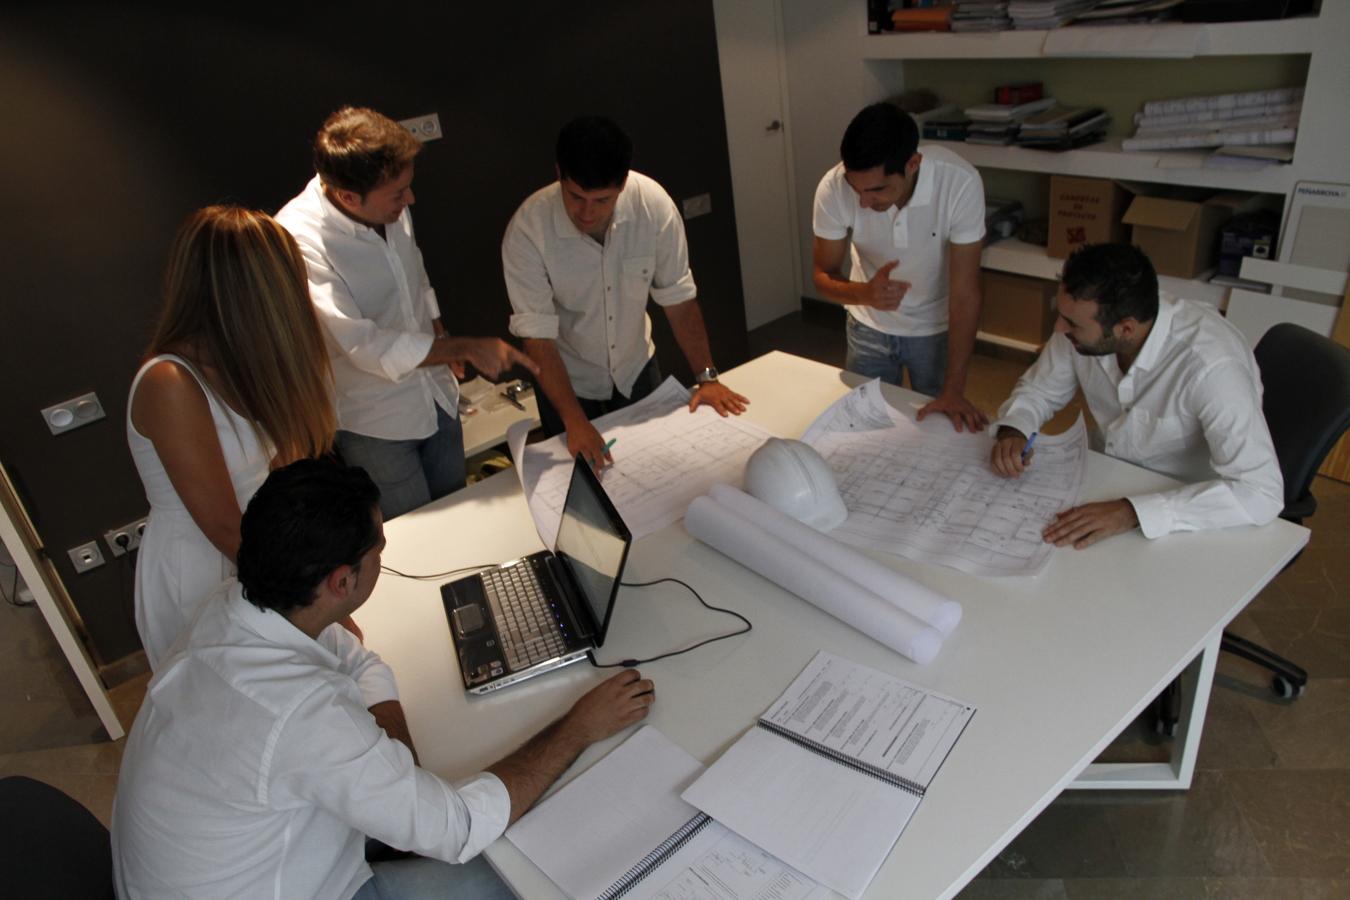 Foto trabajo en equipo multidisciplinar 1 de estudio arquitectura dise o 174443 habitissimo - Estudio arquitectura zaragoza ...